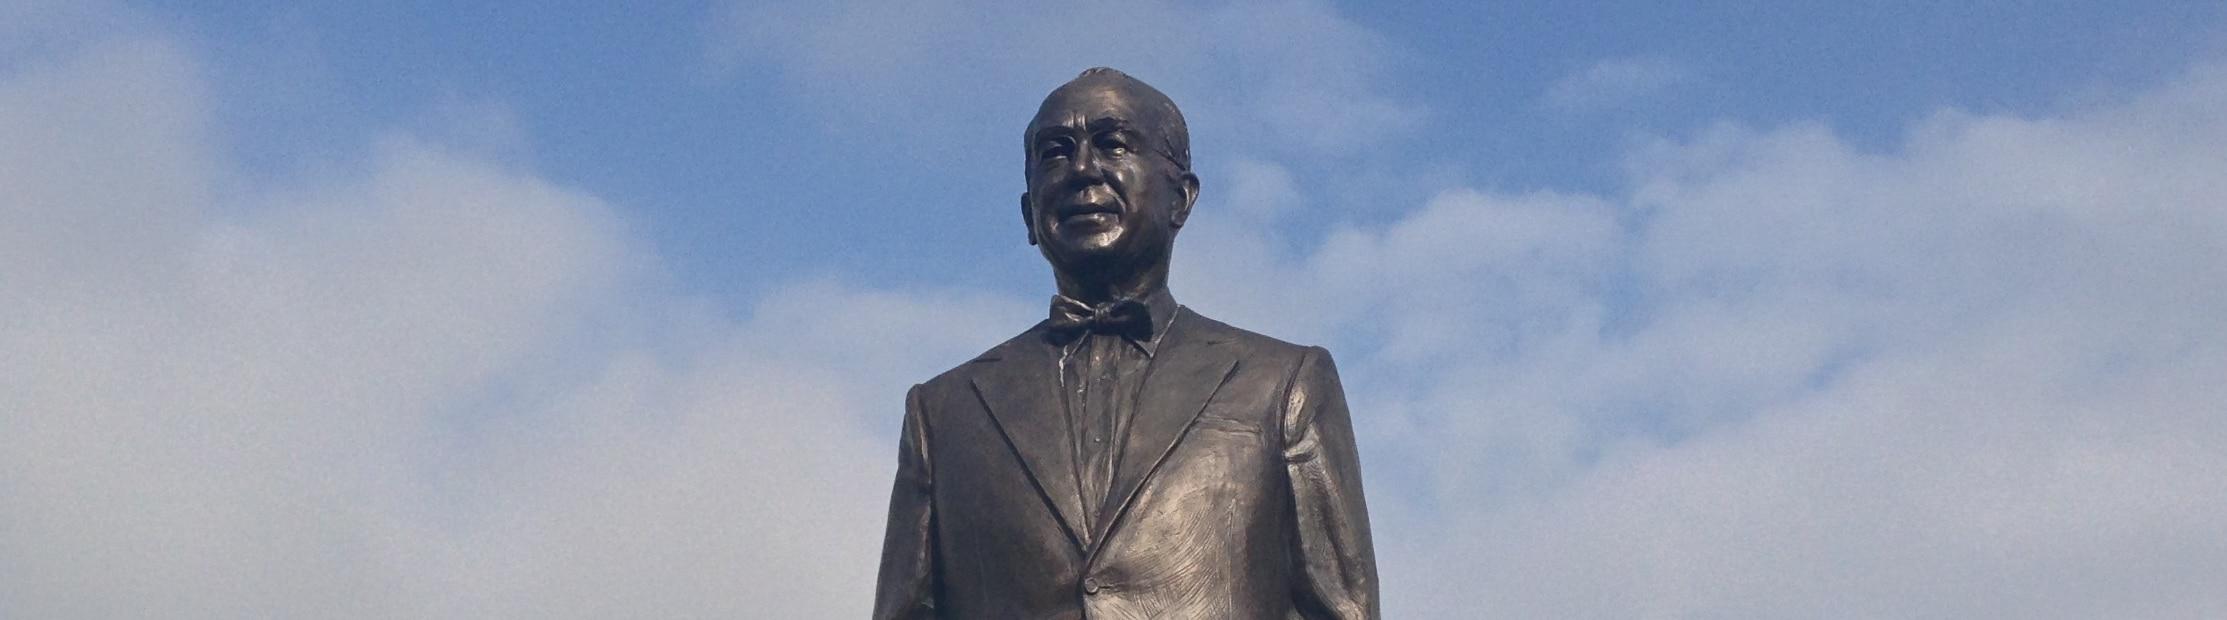 Detail of bronze sculpture of John Ruan, Sr.